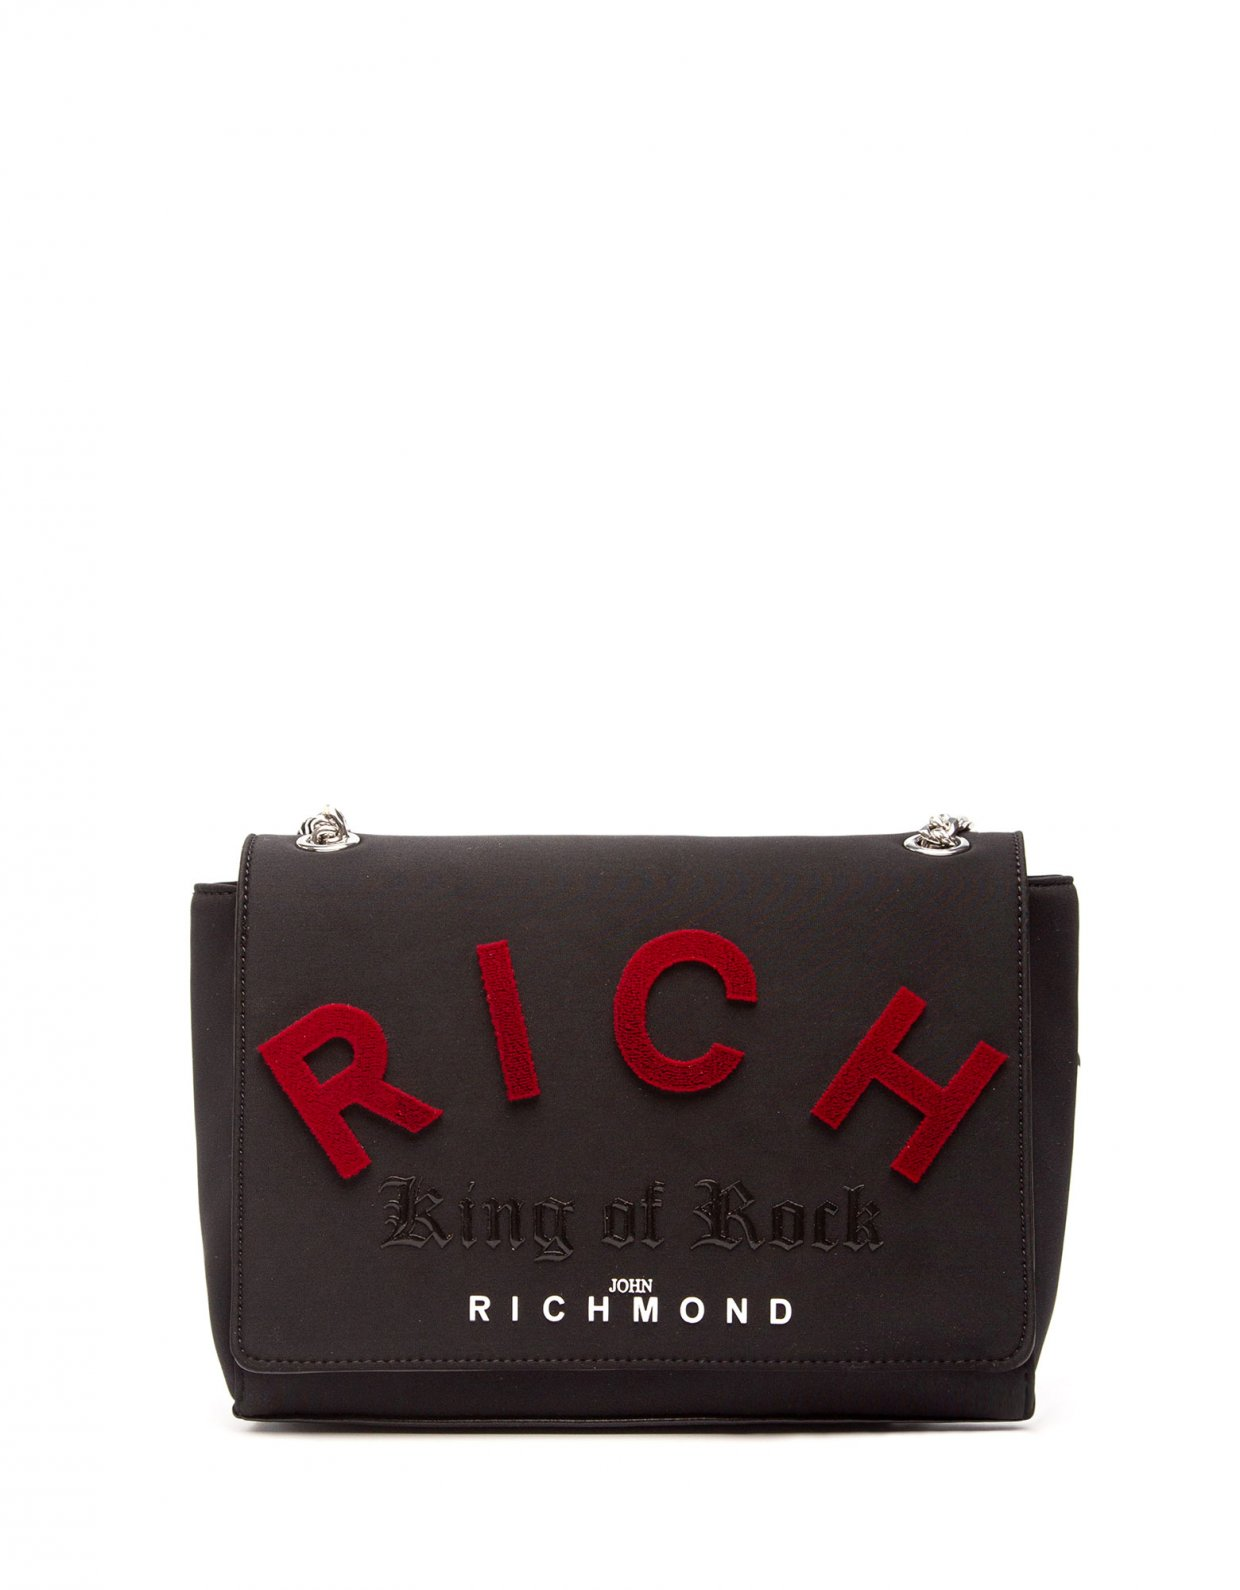 John Richmond Shoulder bag medium Bard